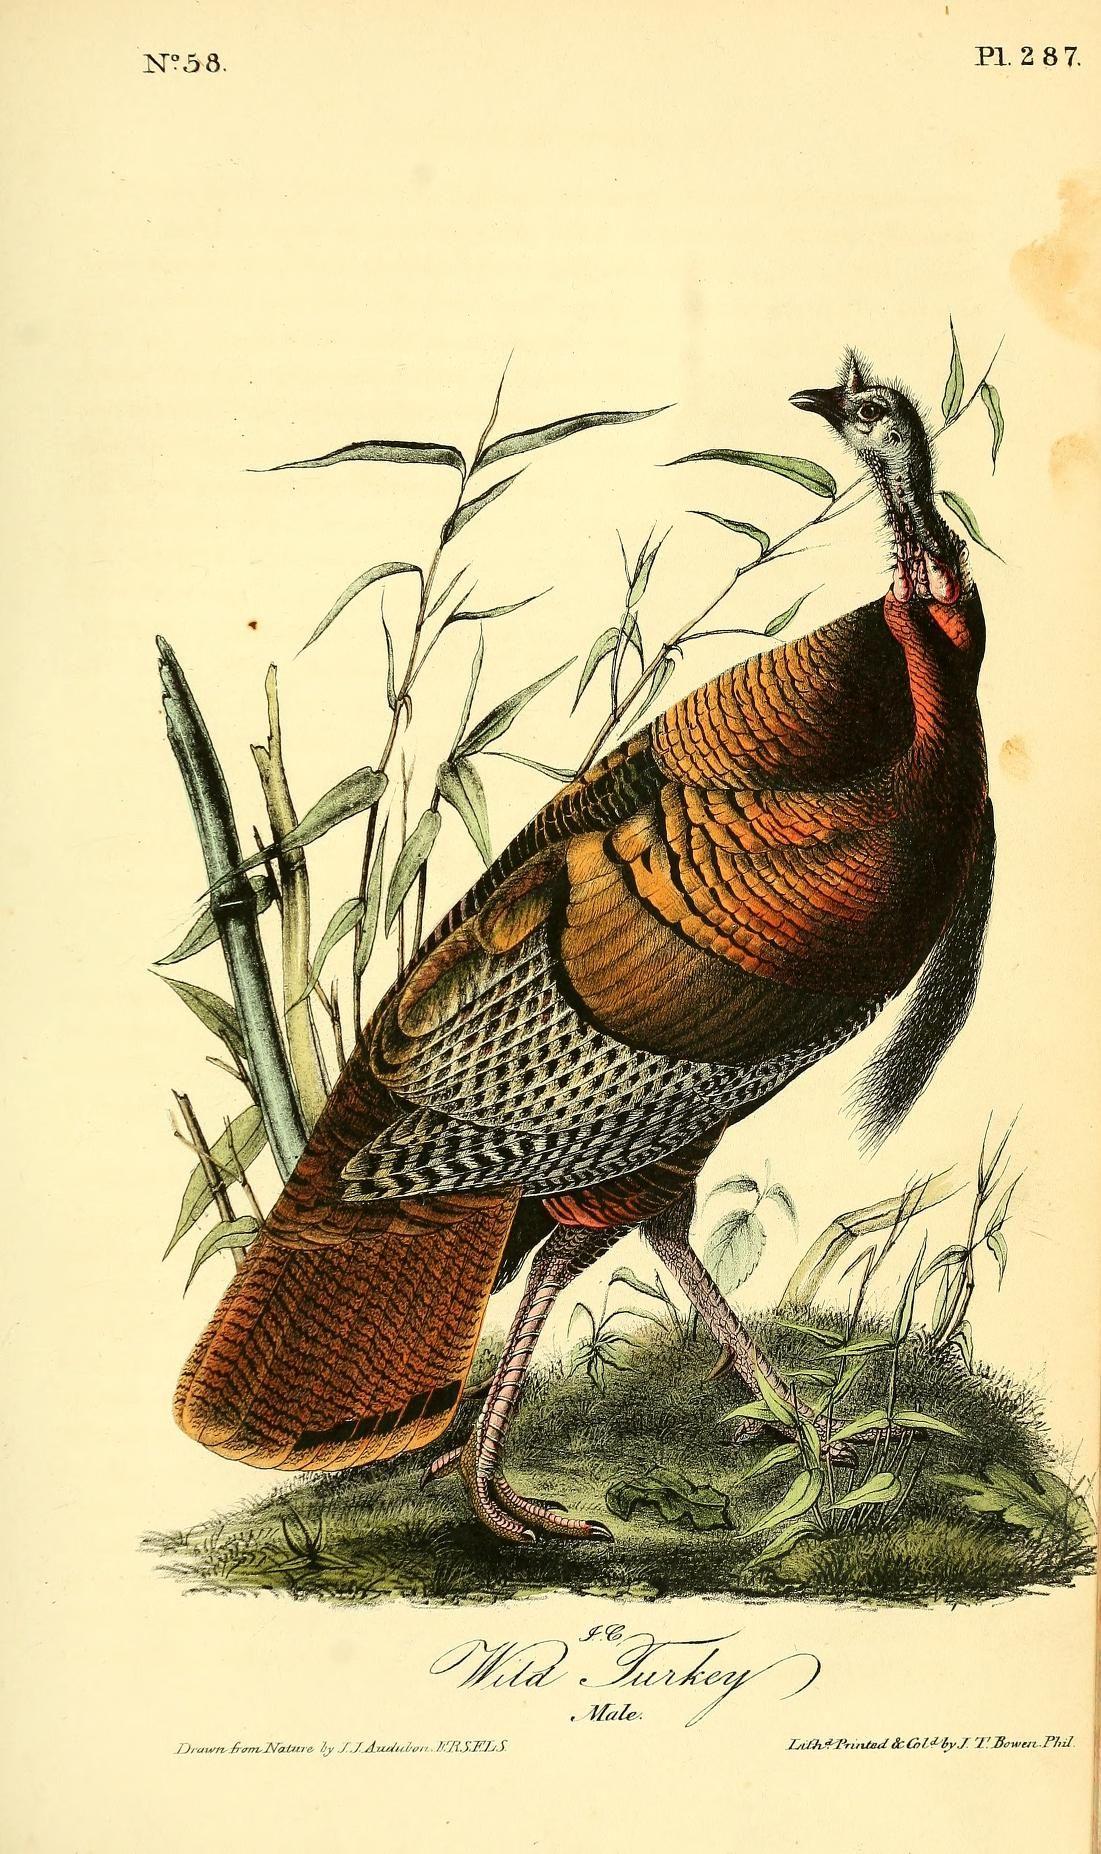 1842, v 5 - The birds of America by John James Audubon : The ...